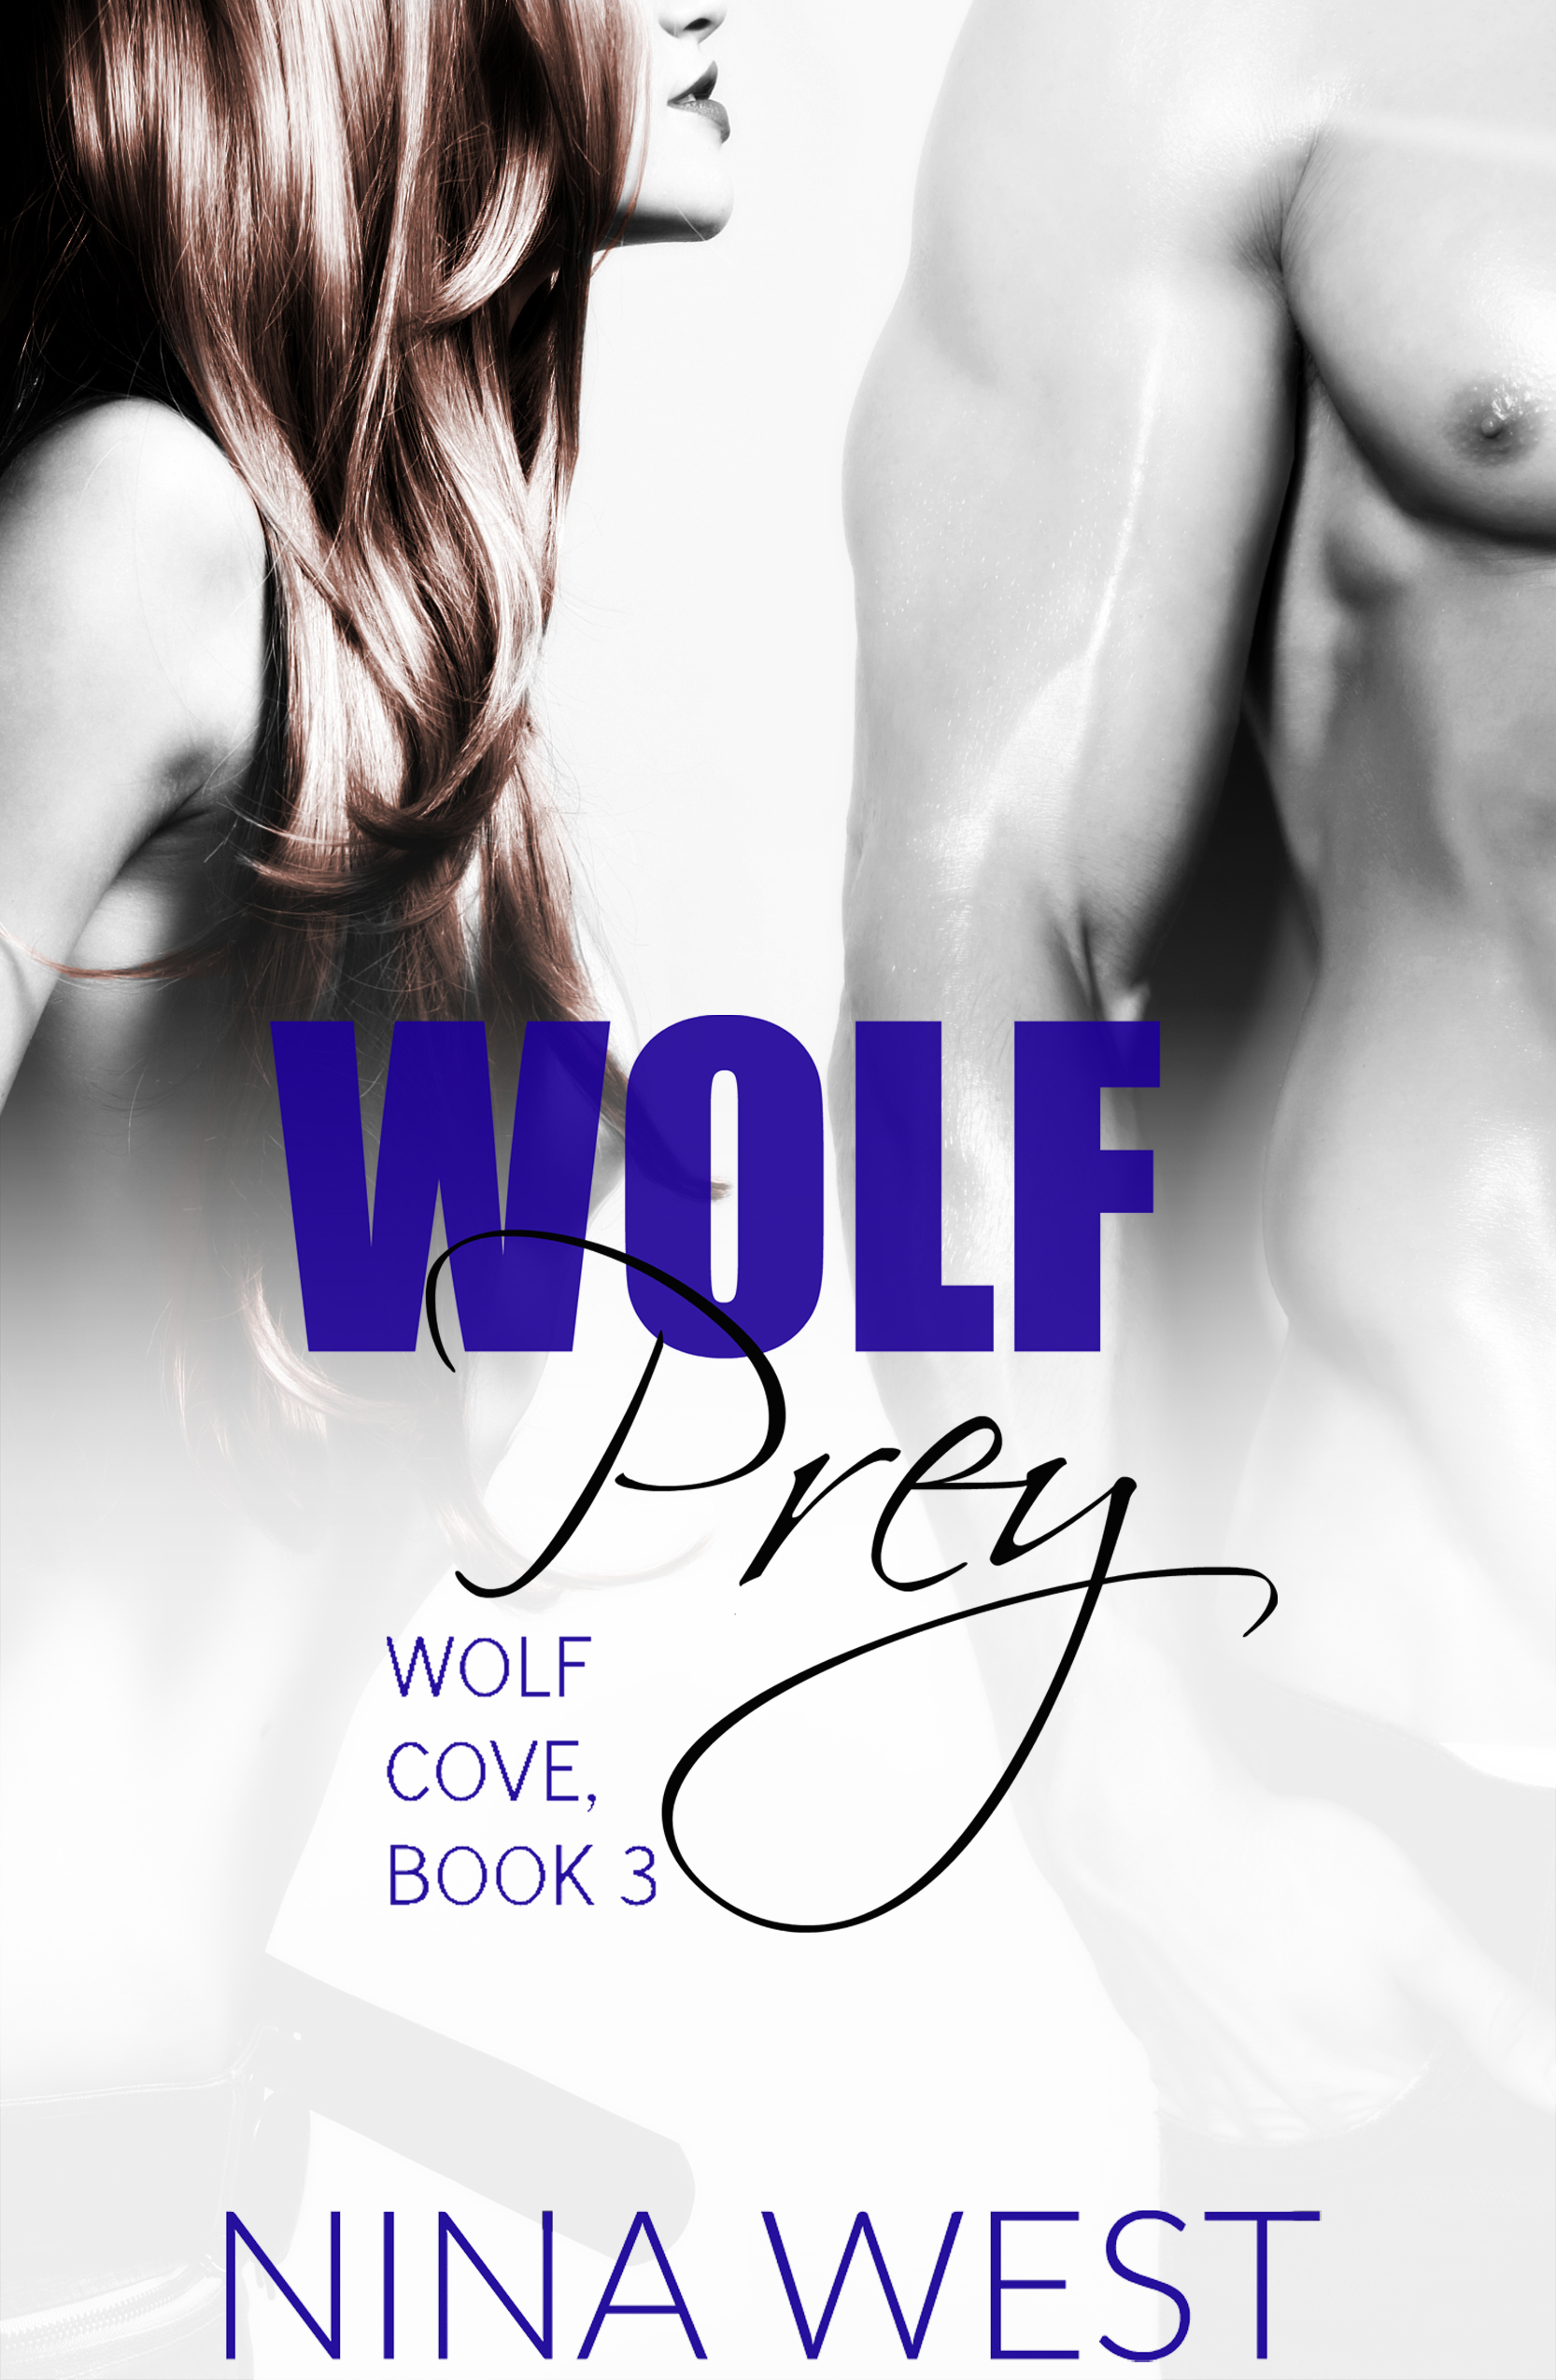 Wolf Prey by Nina West